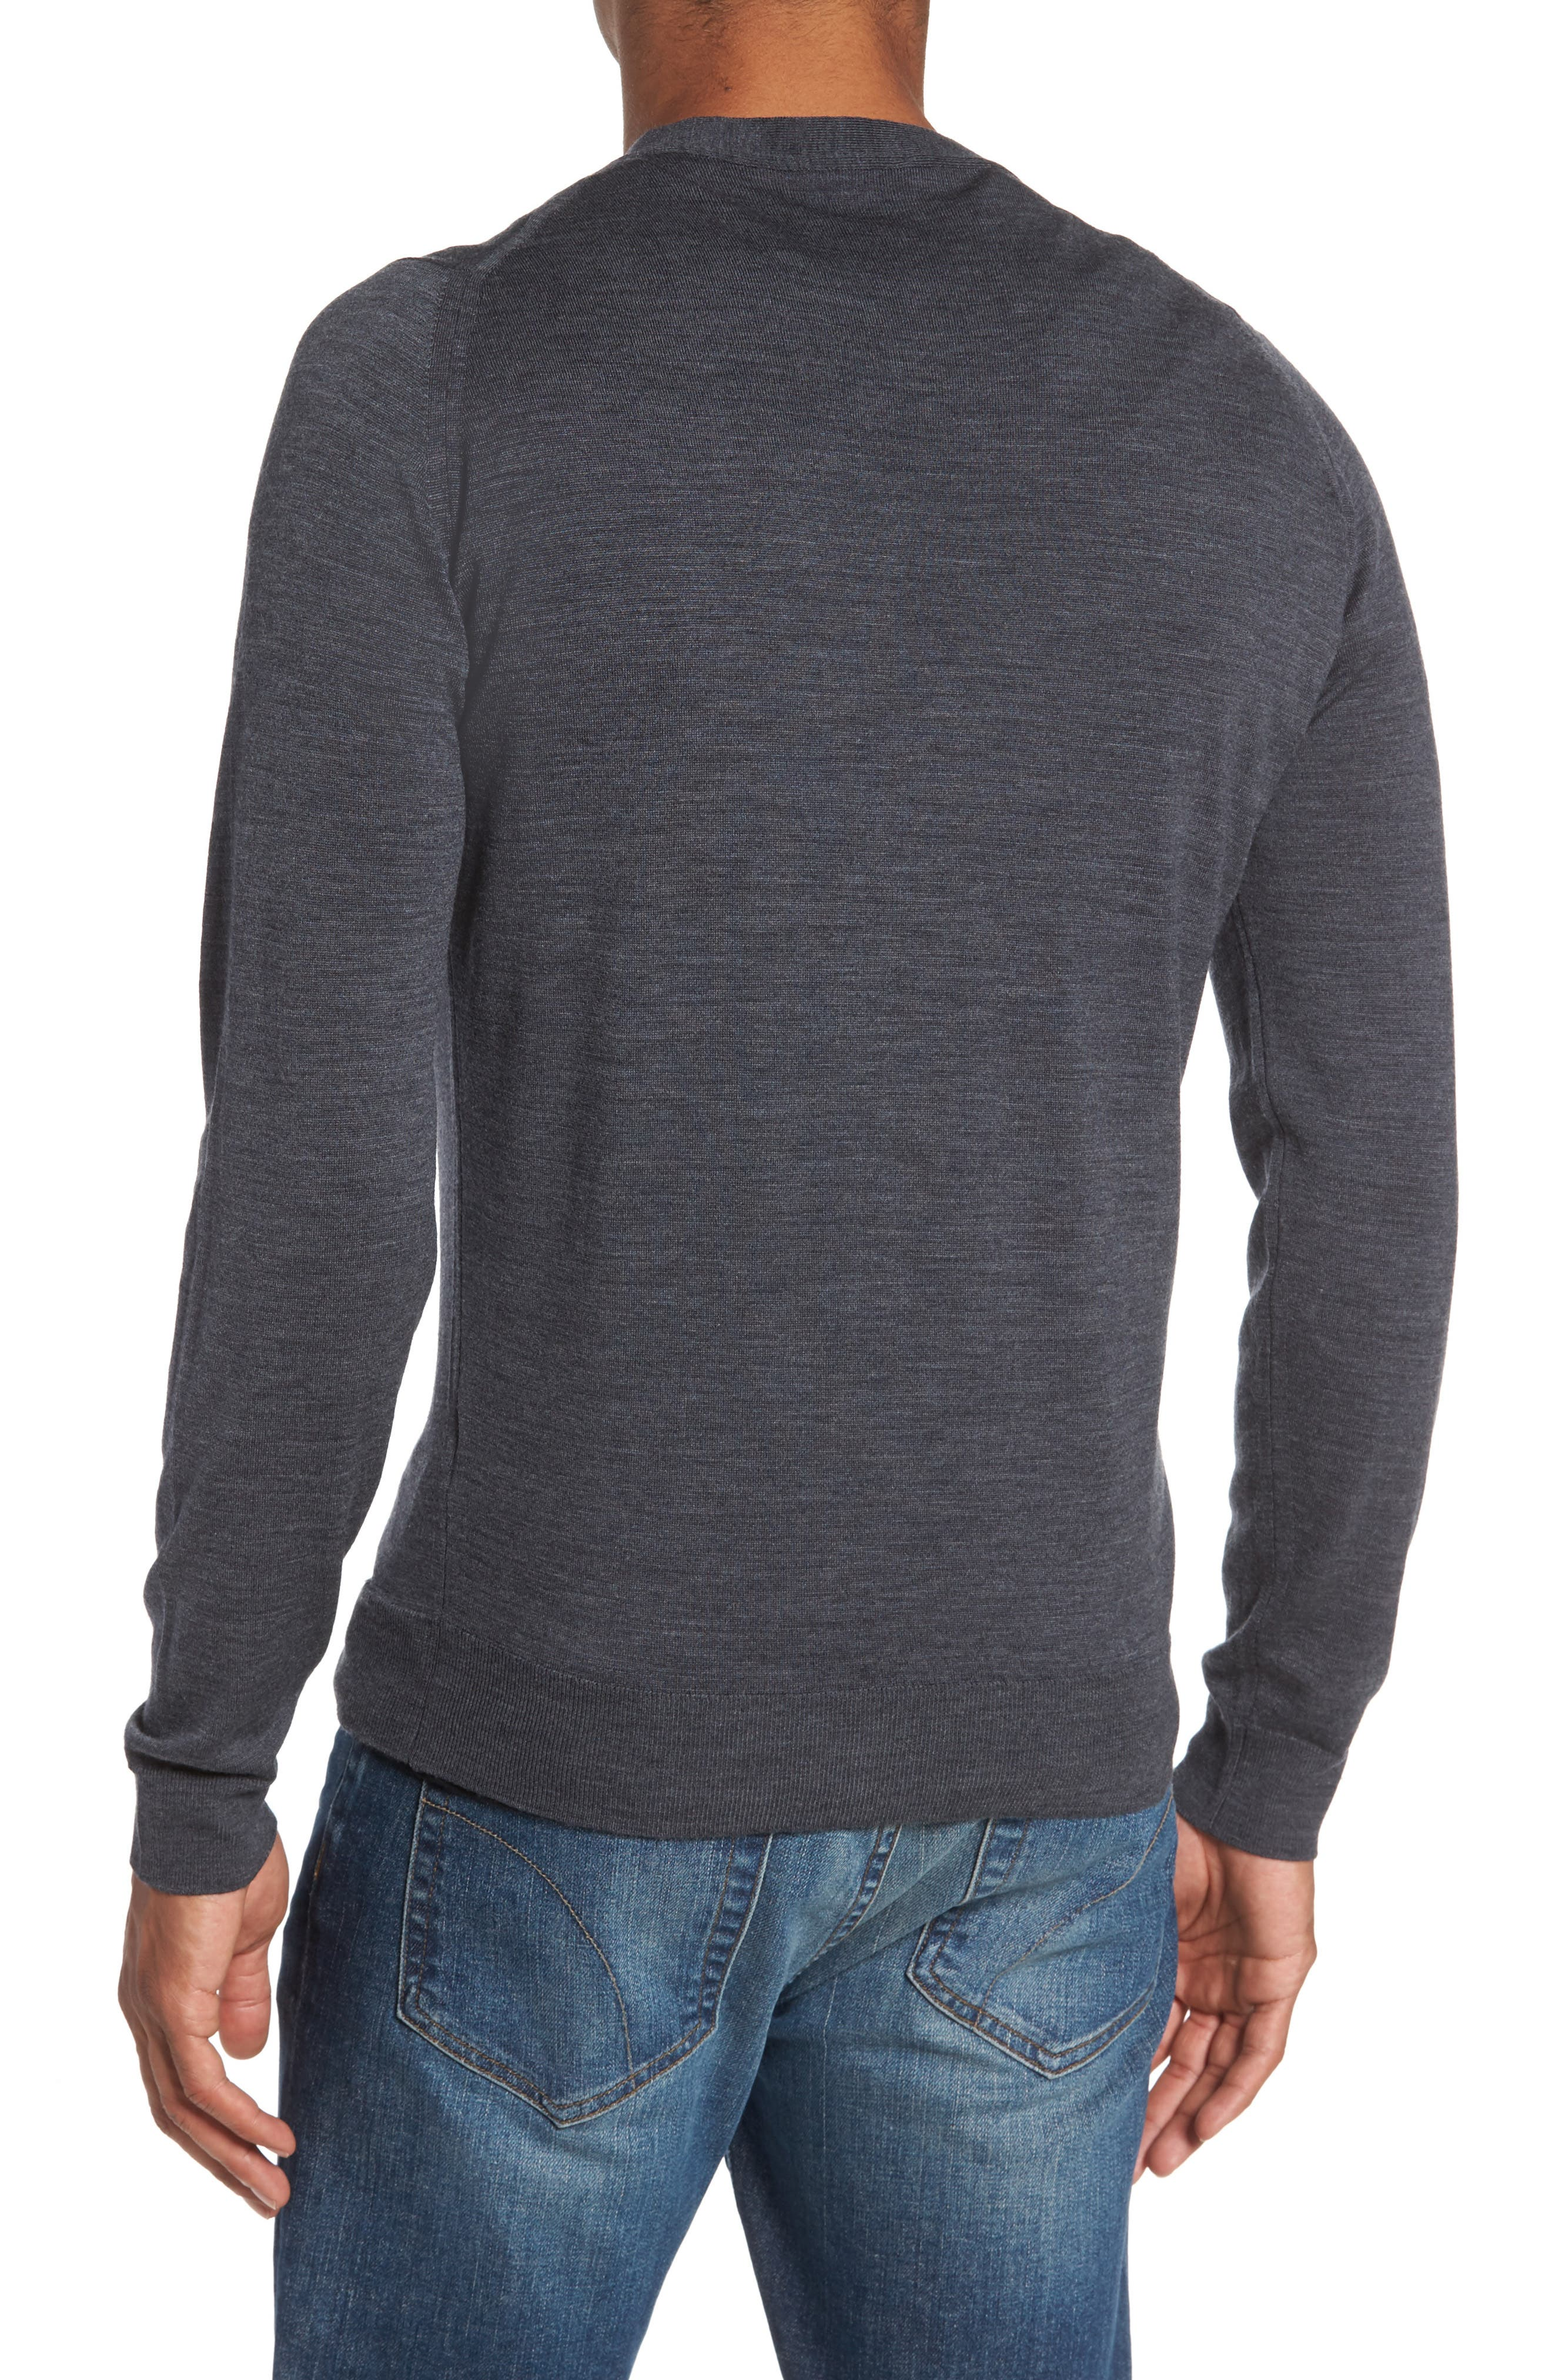 Alternate Image 2  - John Smedley Standard Fit Wool Cardigan